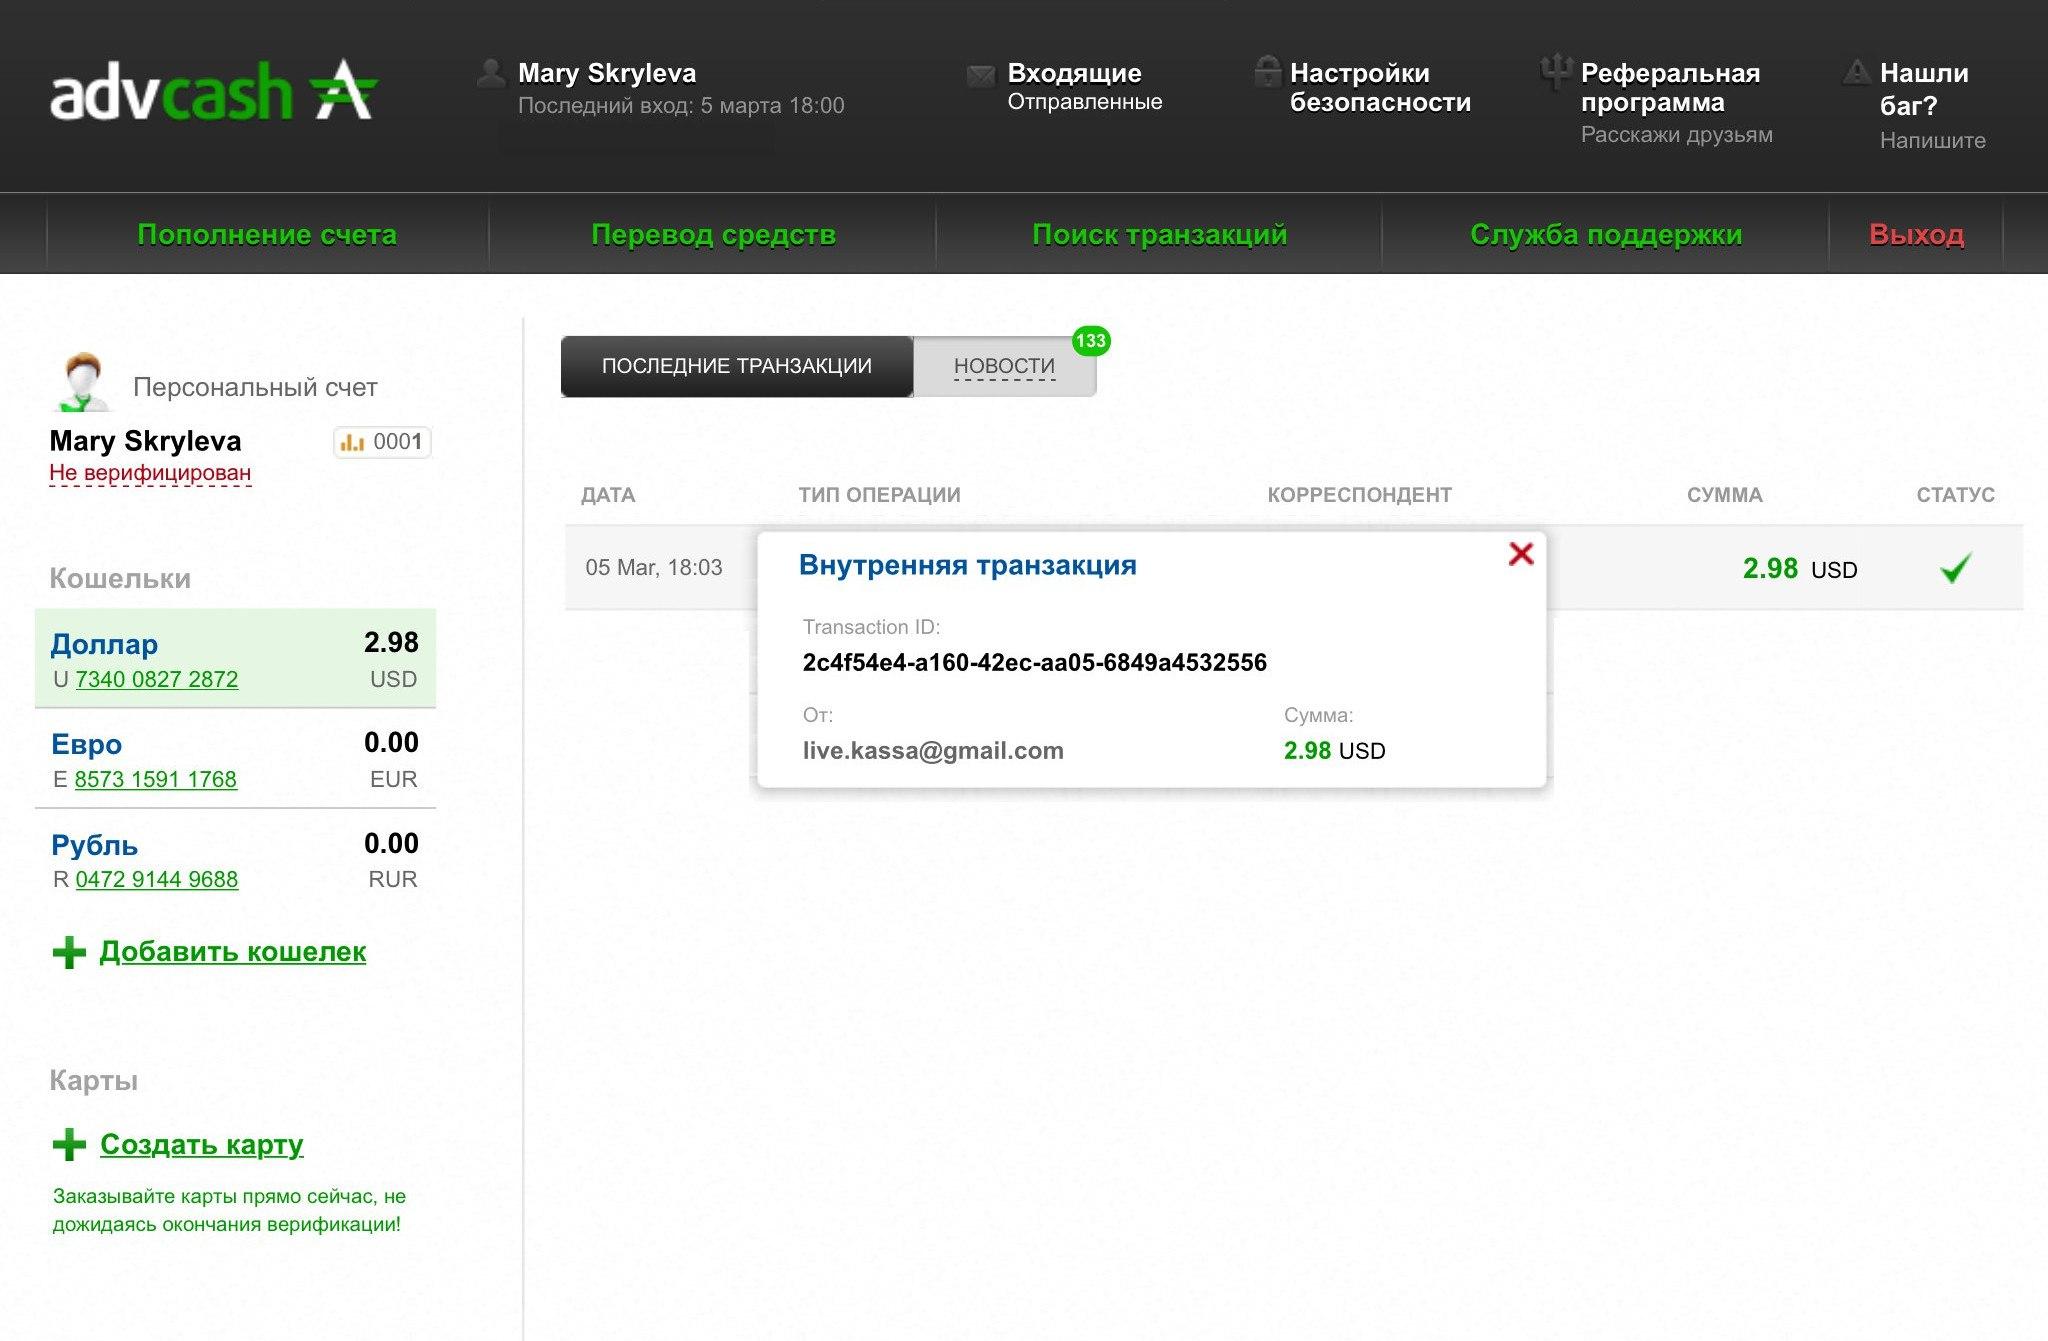 Kassa.cc - единый обмен валюты. Обмен Perfect Money USD на Advanced Cash USD